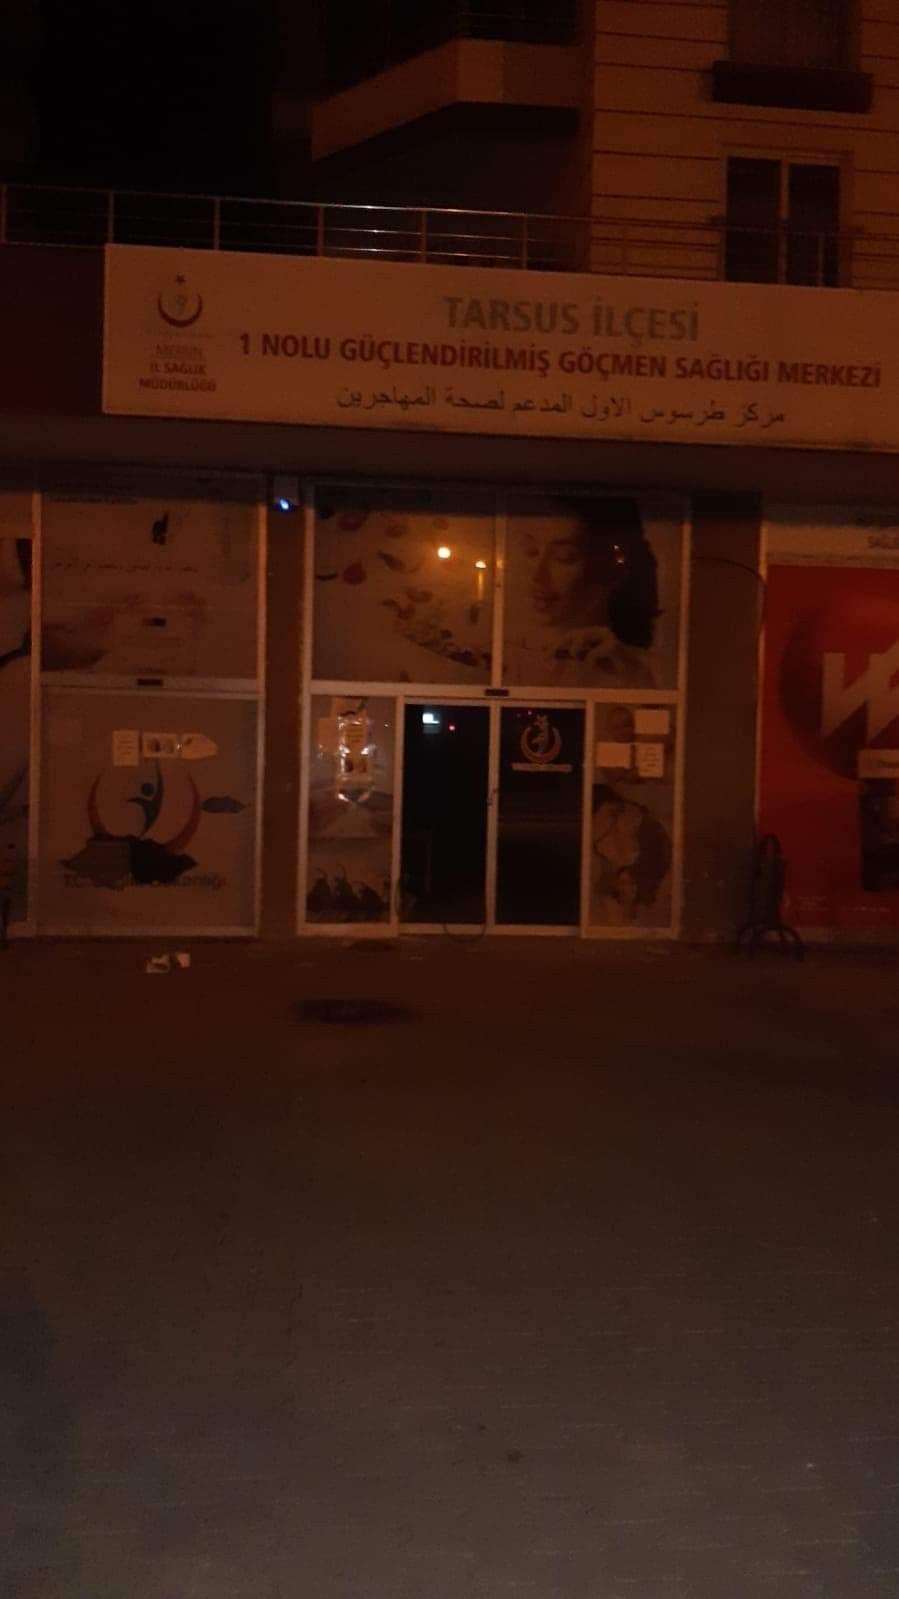 gocmen-sagligi-merkezine-molotoflu-saldiri-siyassetcafe01.jpg